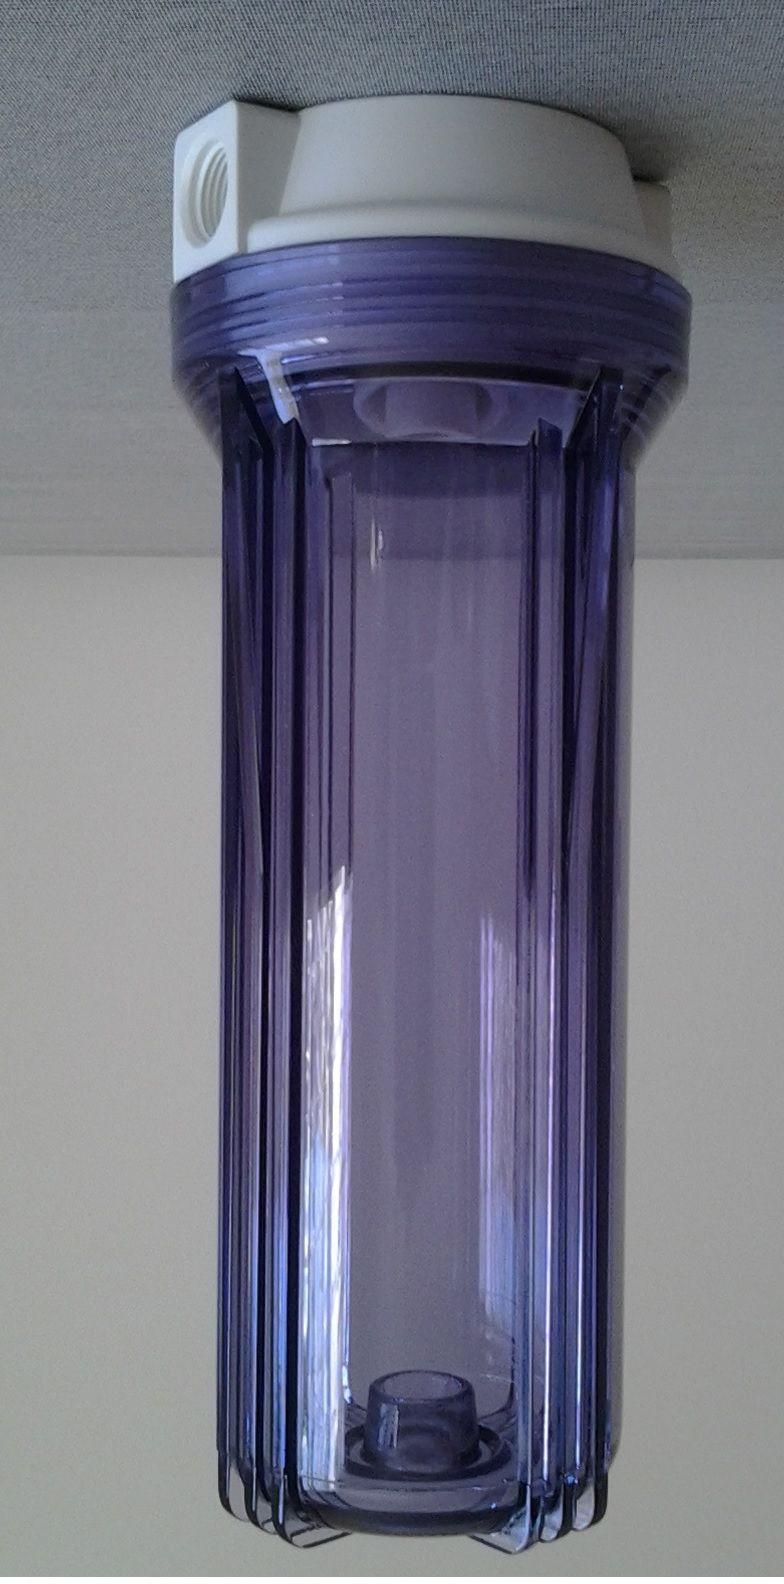 Filtro de água POE 10 x 2.1/2 Transparente Plissado Lavável